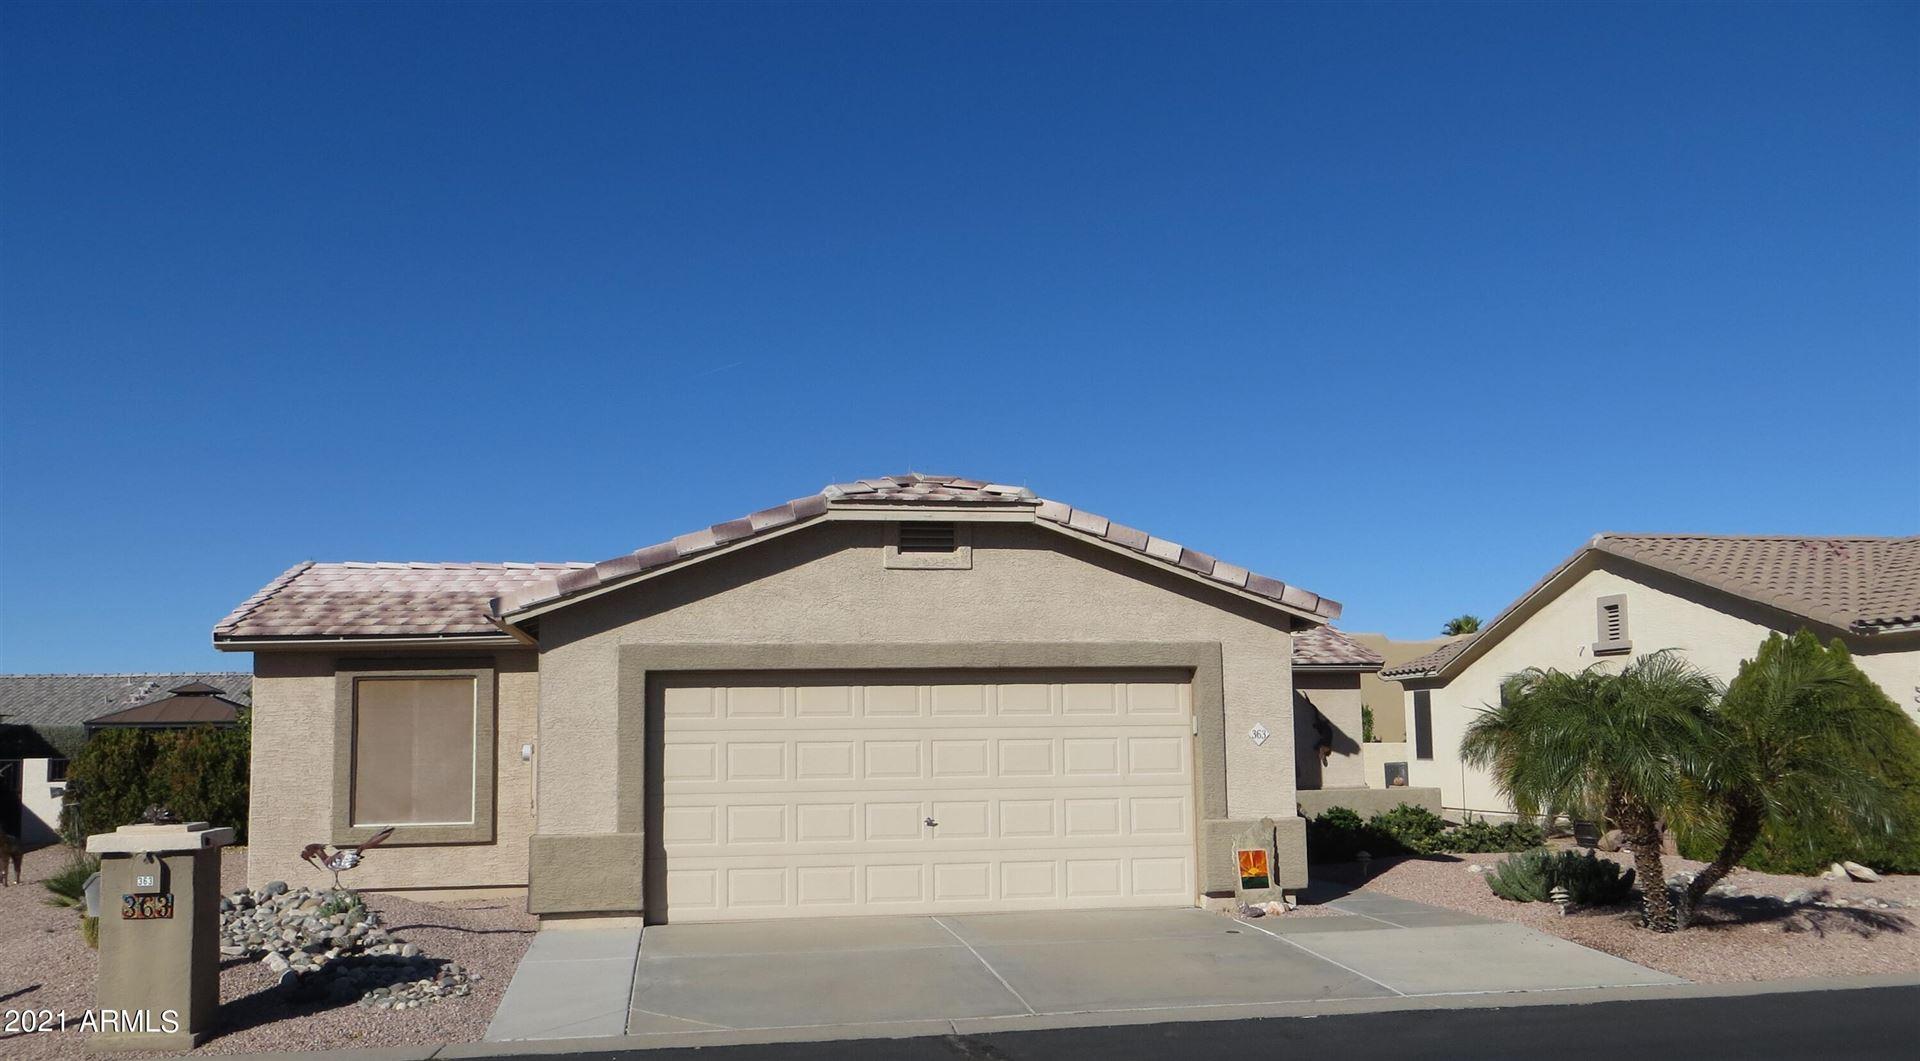 Photo of 2101 S MERIDIAN Road #363, Apache Junction, AZ 85120 (MLS # 6198151)